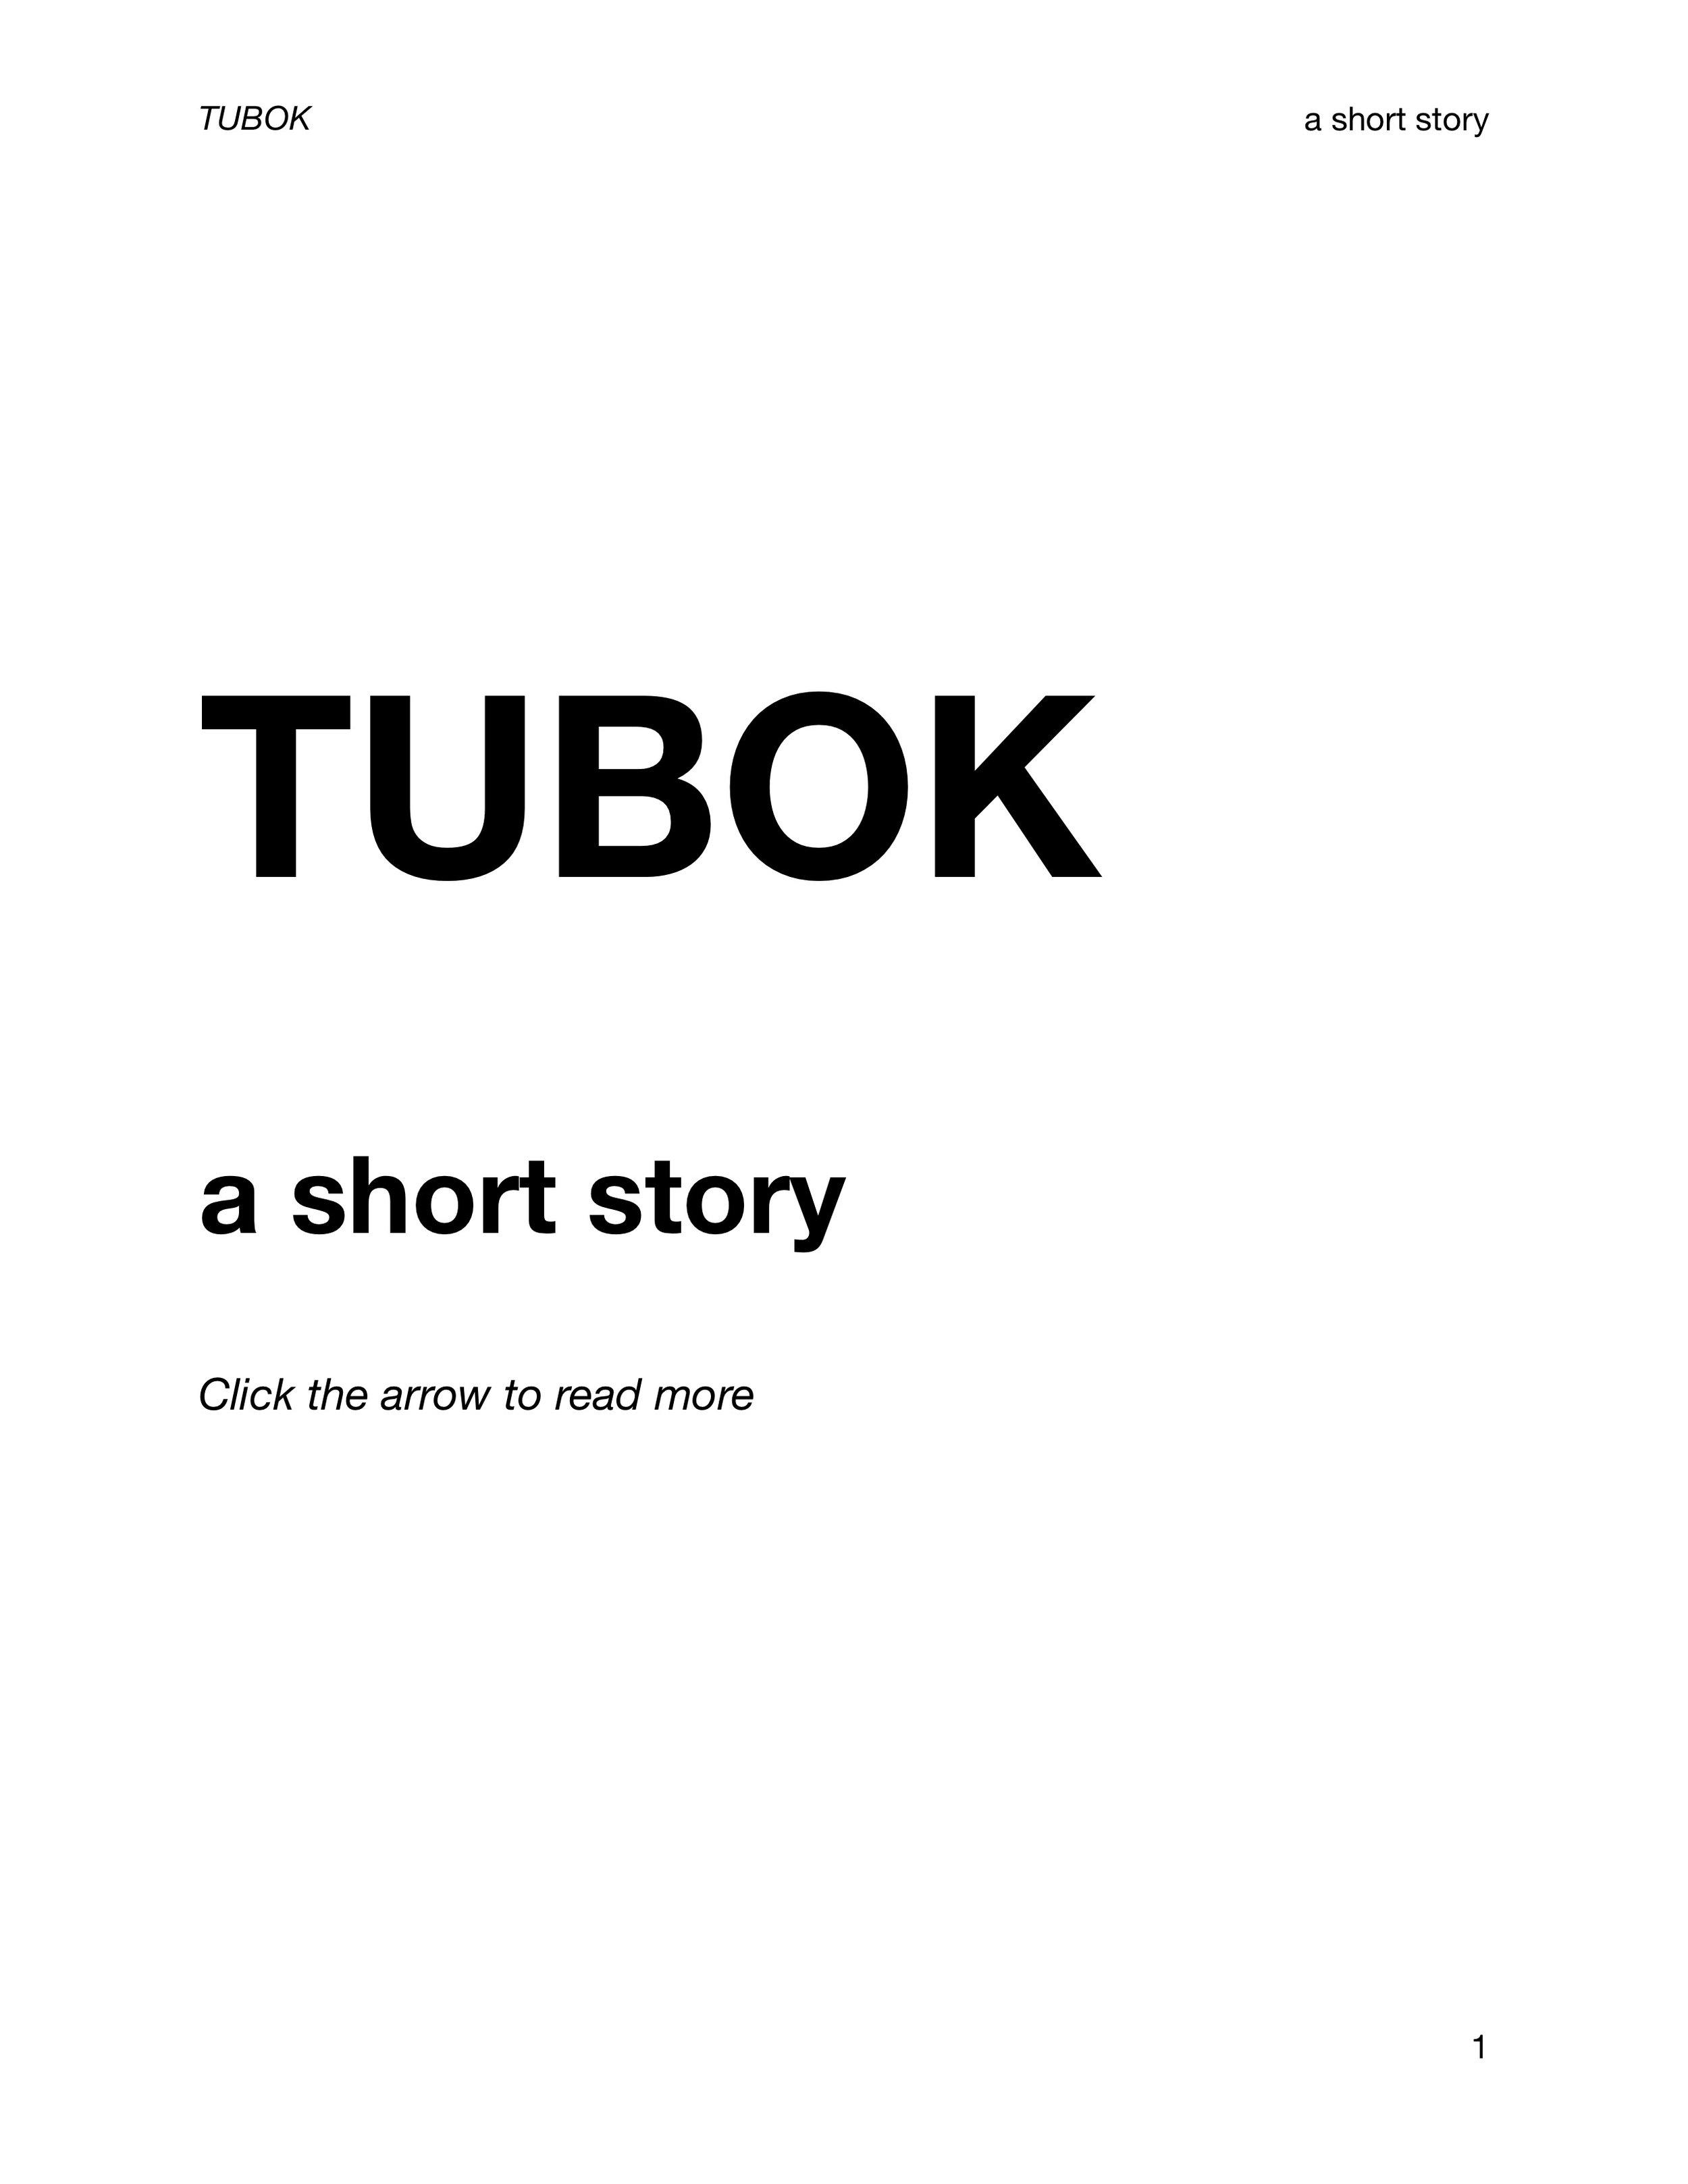 TUBOK (A Short Story) cover.jpg